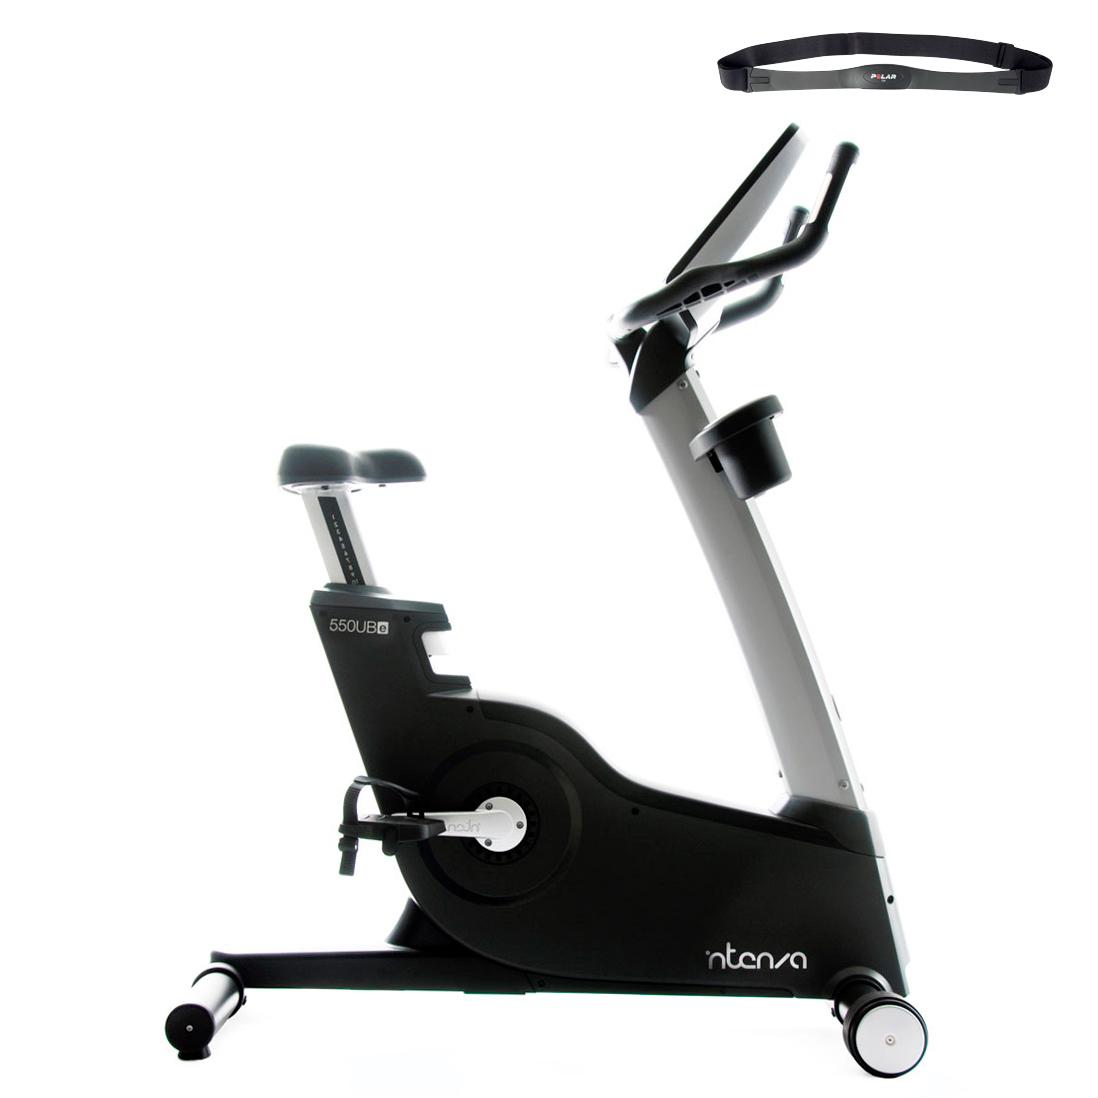 Profesjonalny rower treningowy pionowy Intenza 550UBe